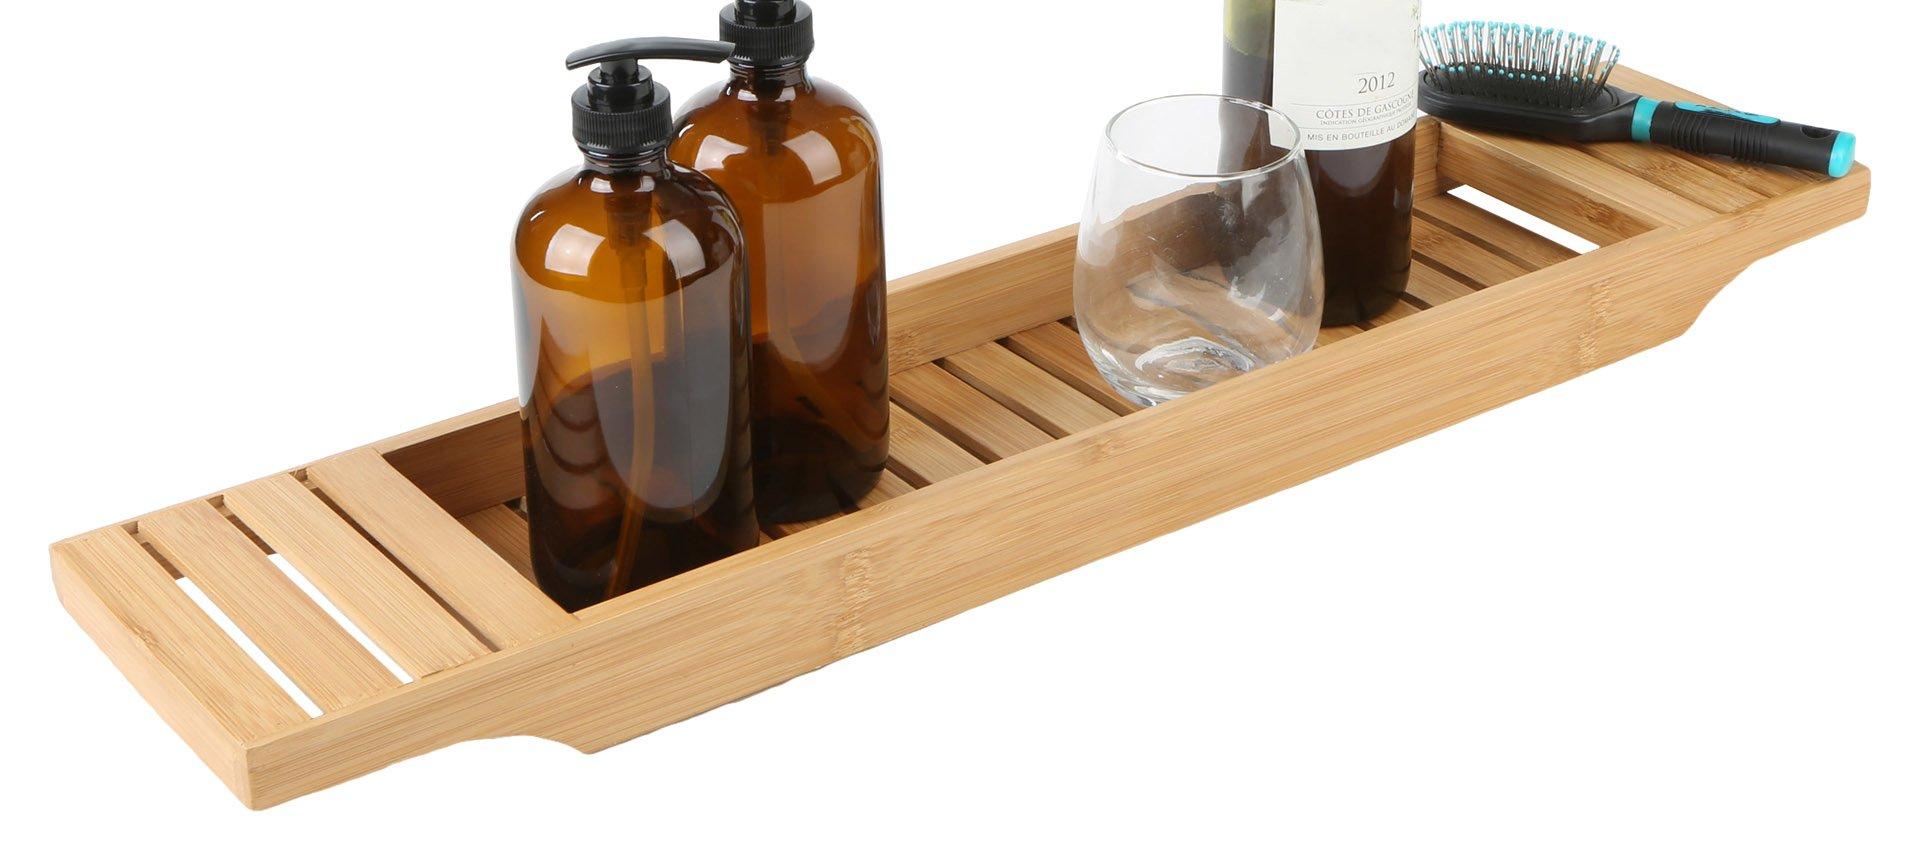 Mind Reader Bathroom Shower Organizer for Shampoo, Soap, Razors, and Much More Bamboo Bathtub Tray Caddy, Brown, Bath